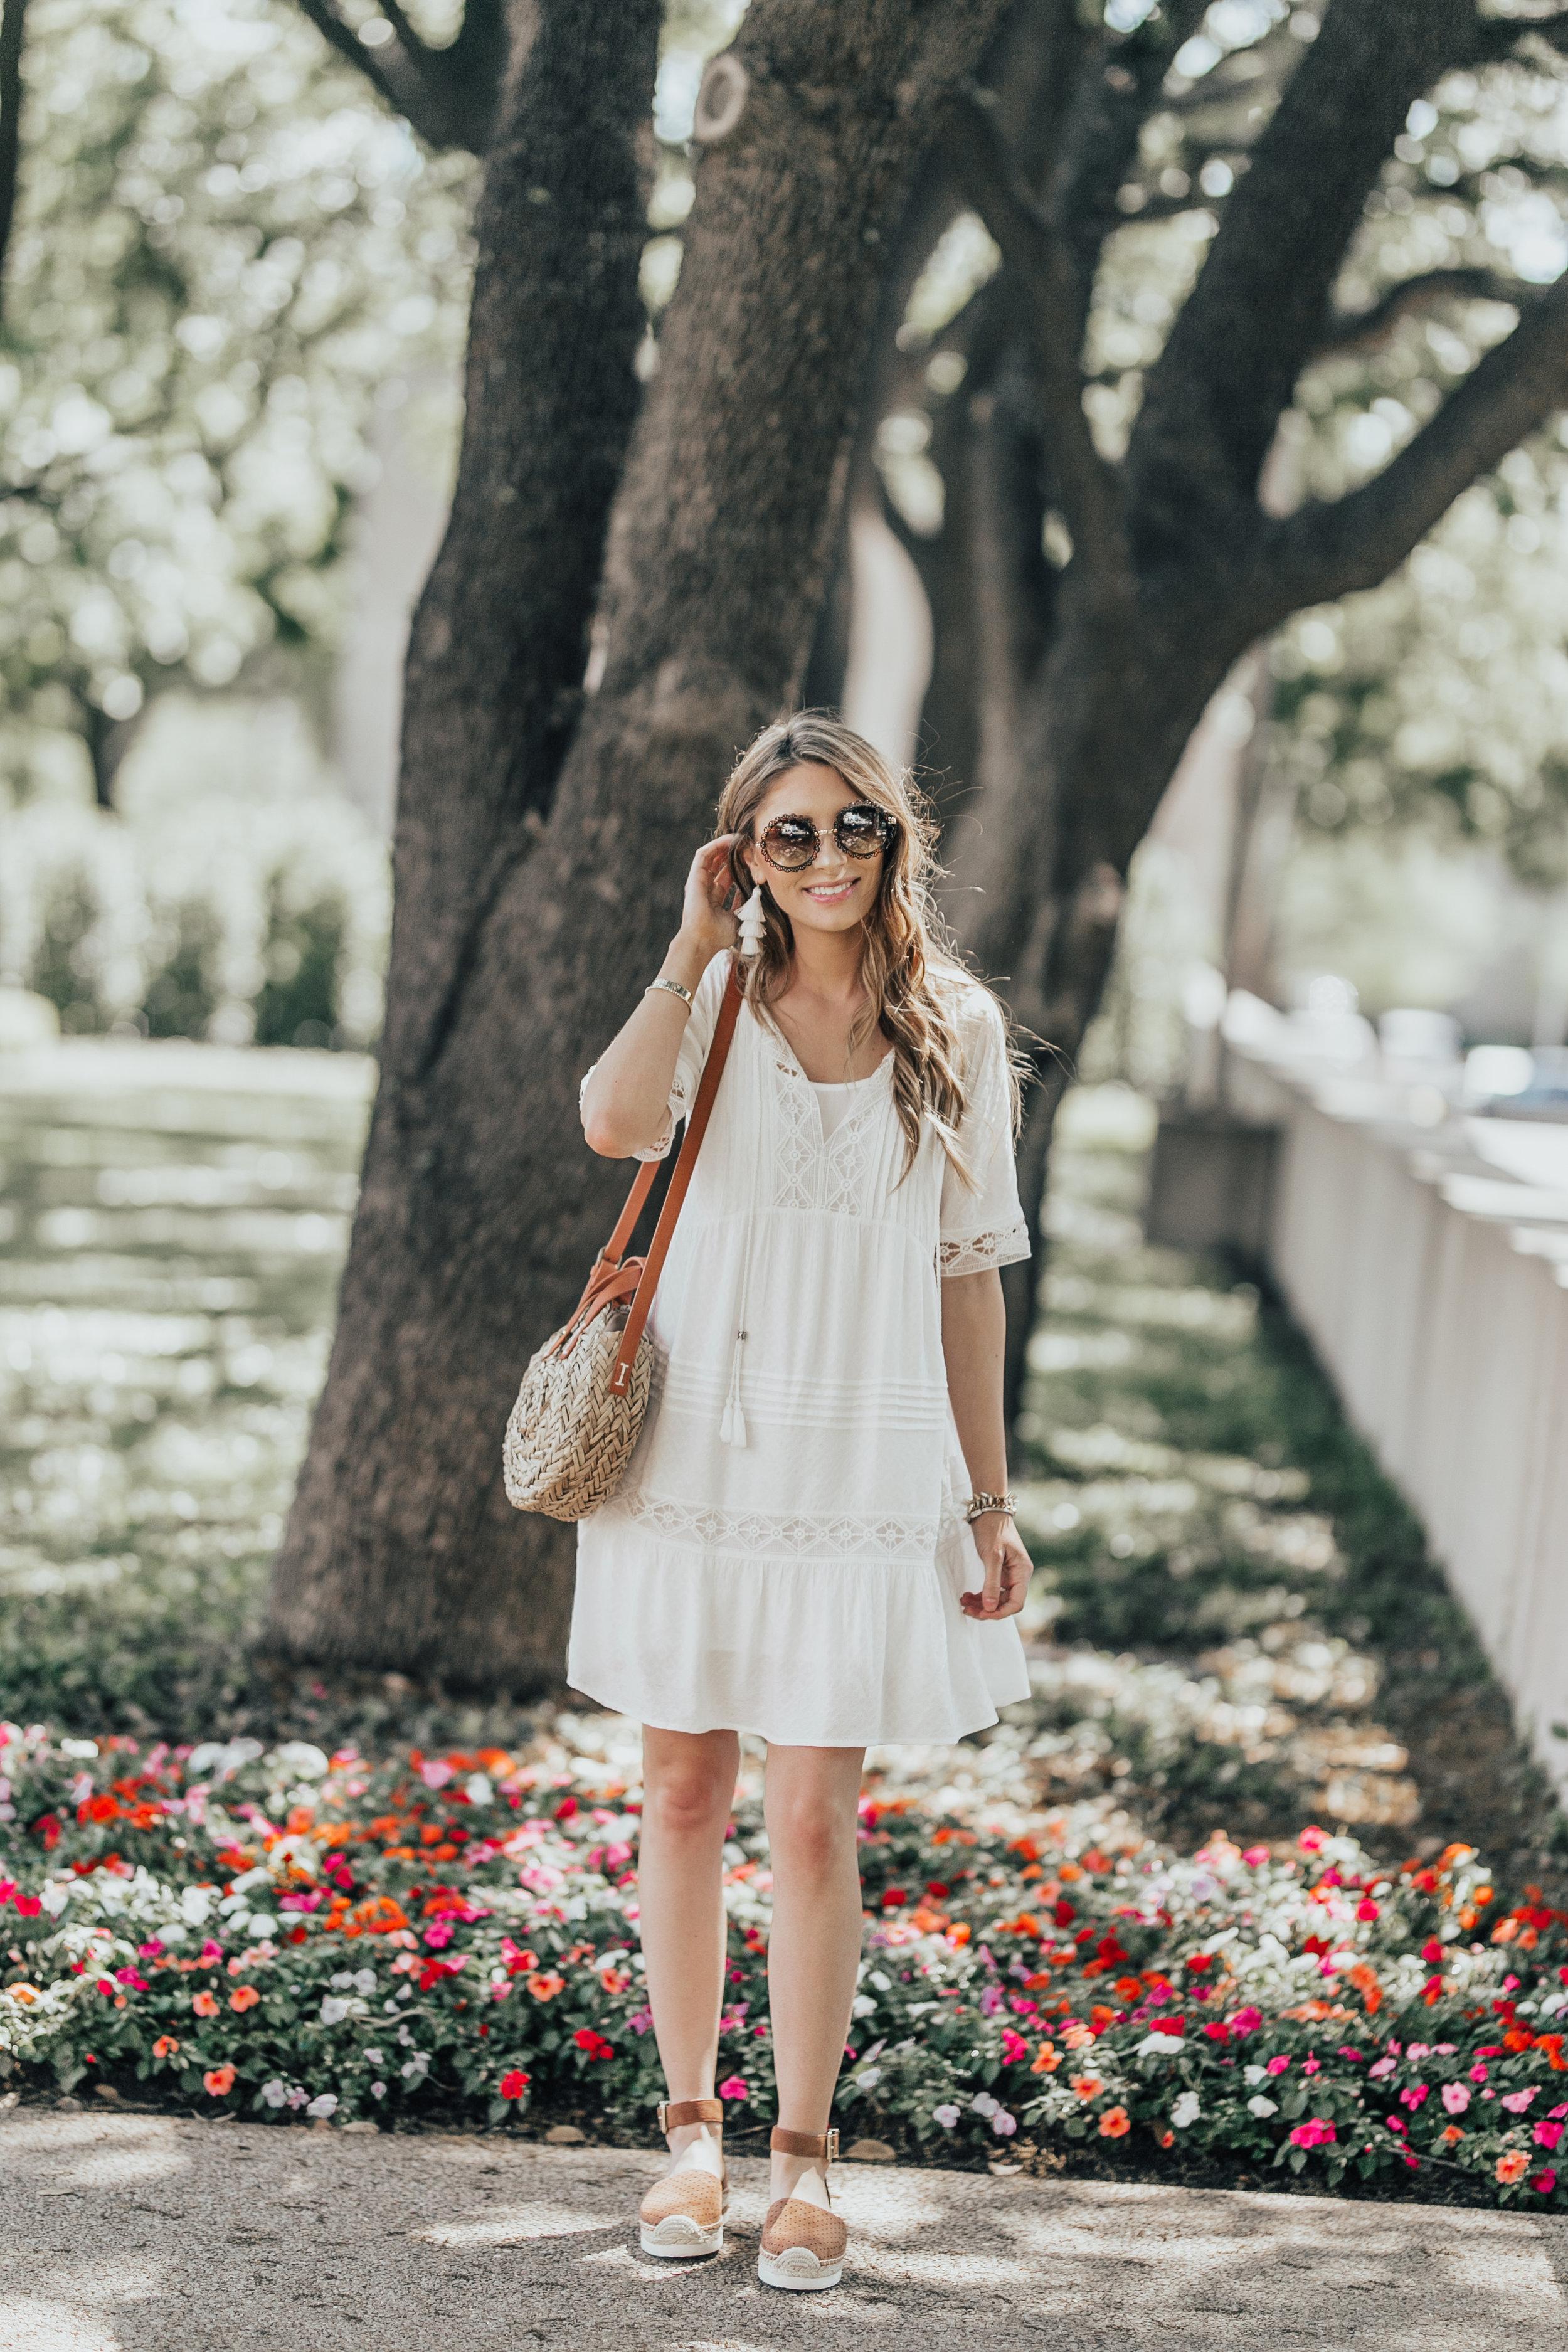 White Dress + Round Straw Bag